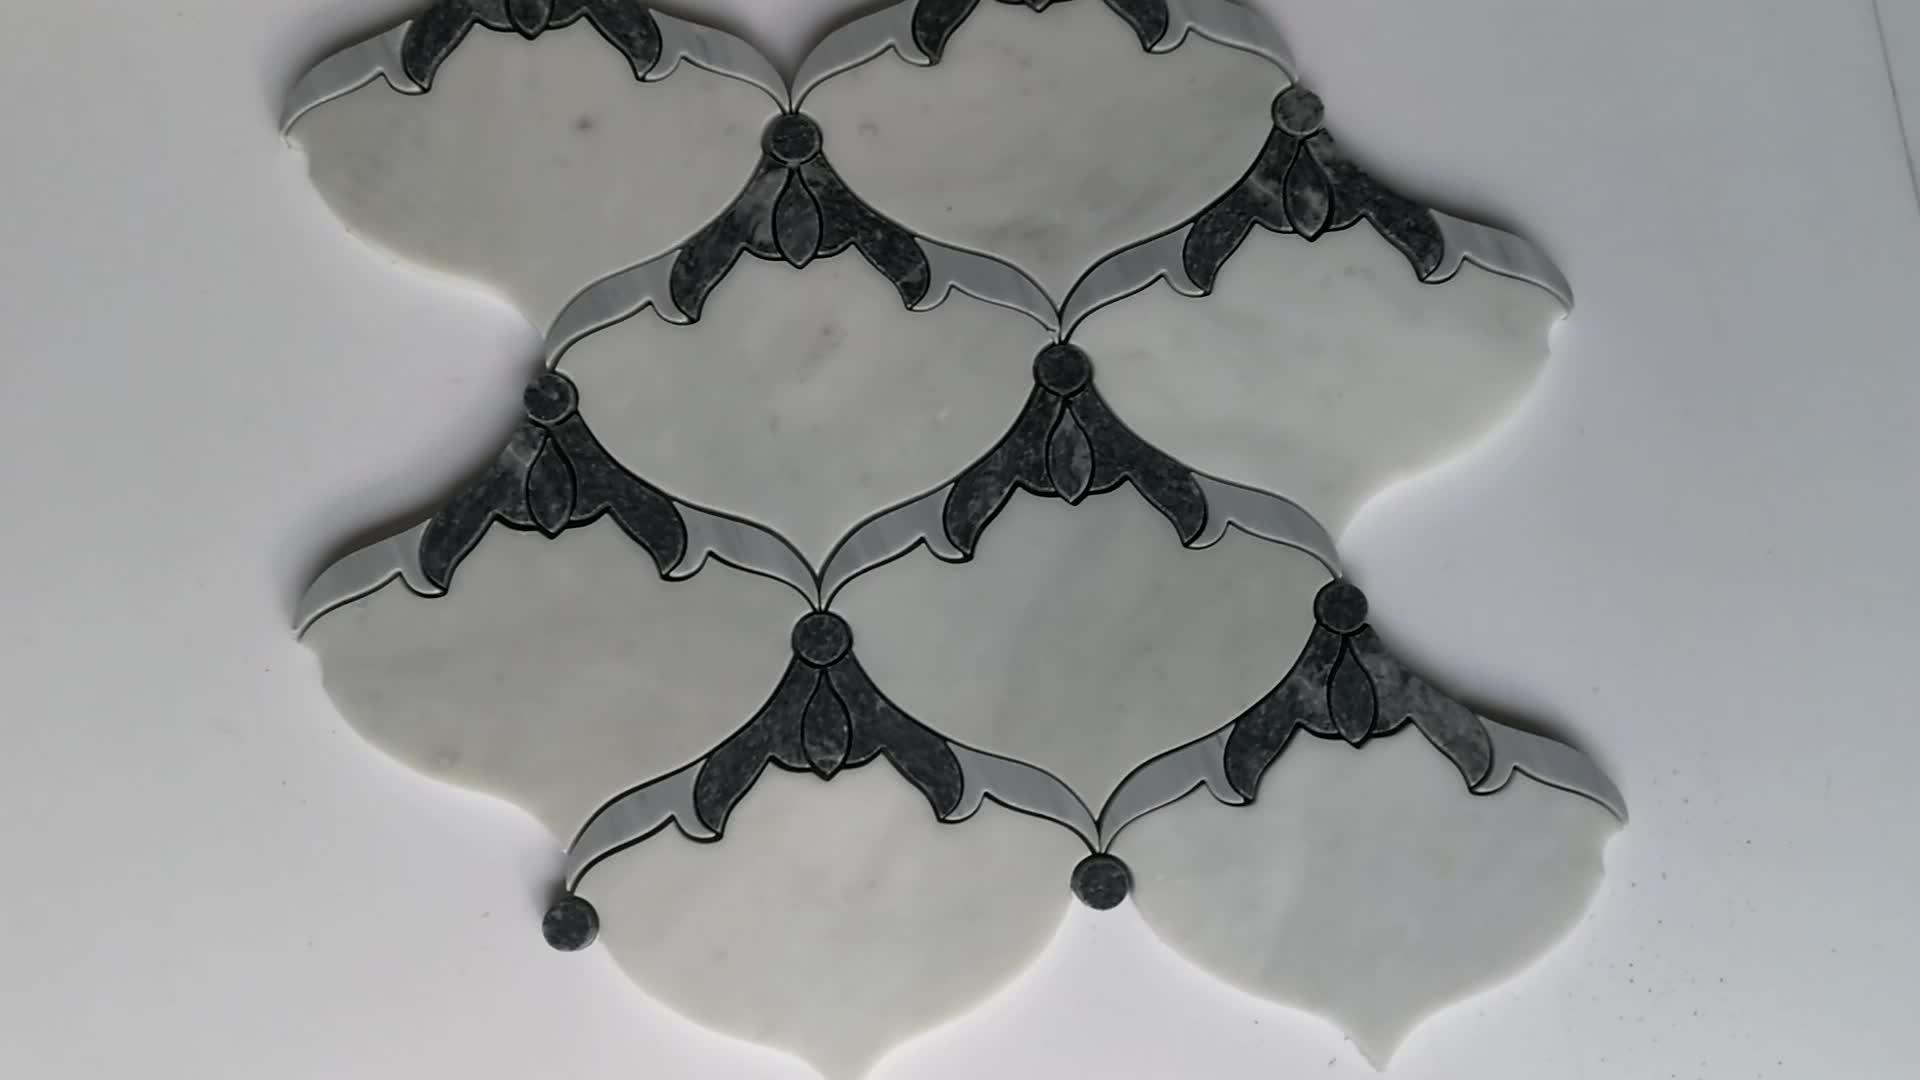 Carrara White With Black Flower WaterJet Mosaic Tile